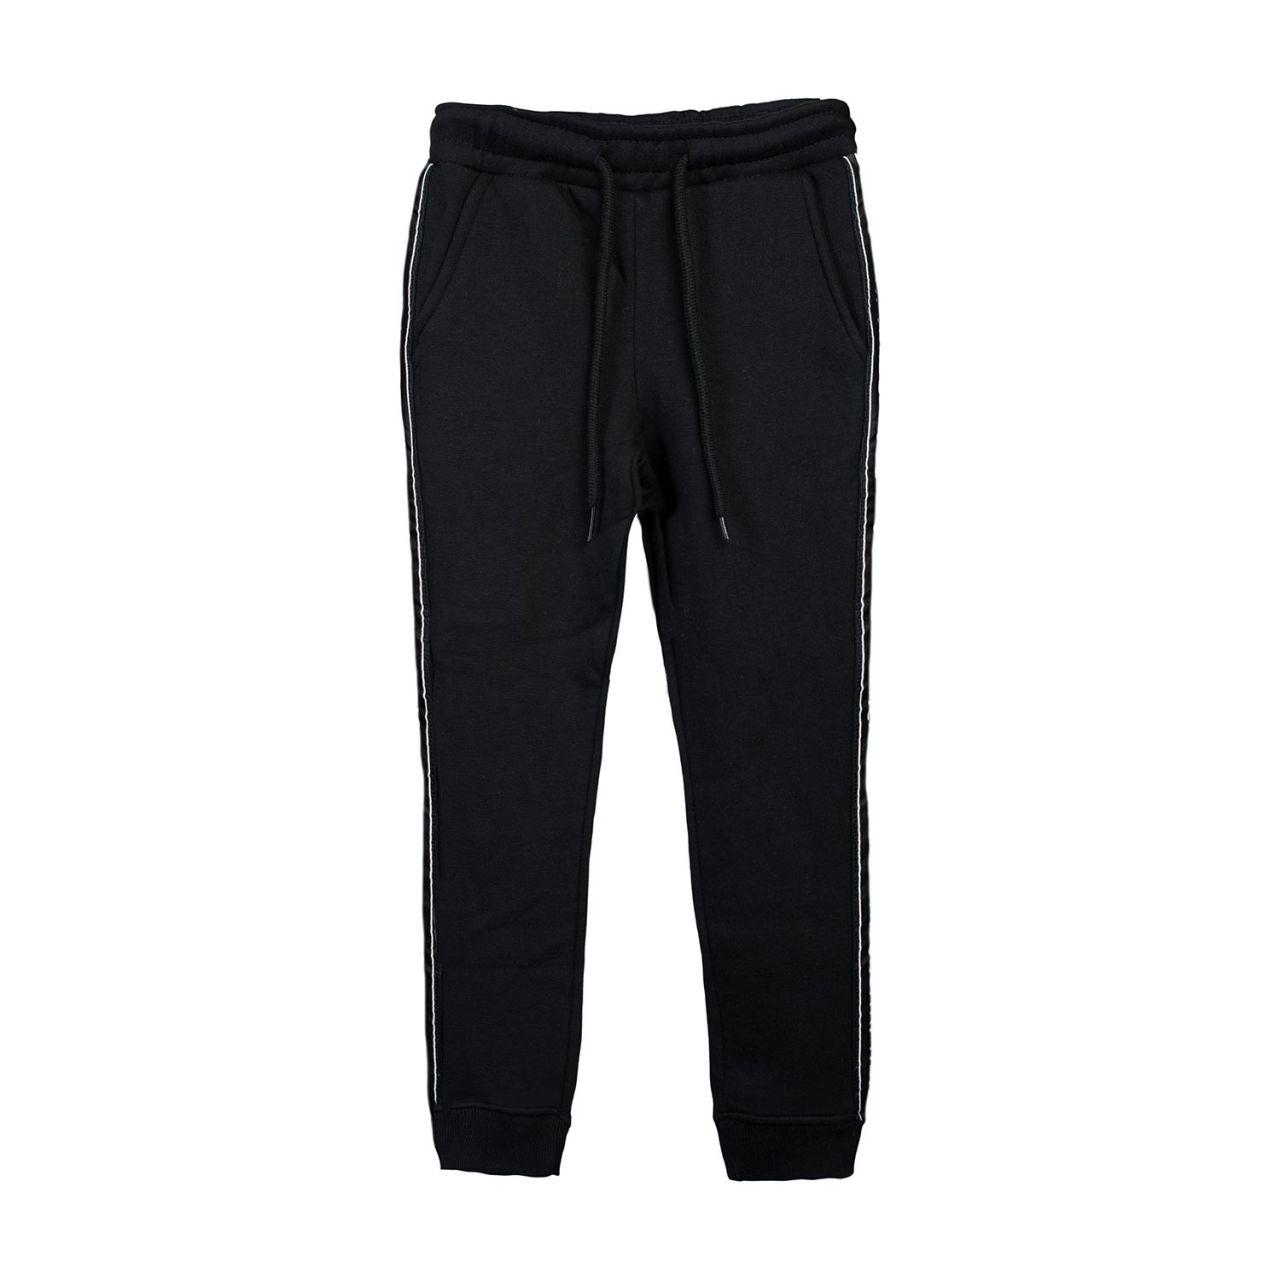 Damen Sweatpants, black, tape